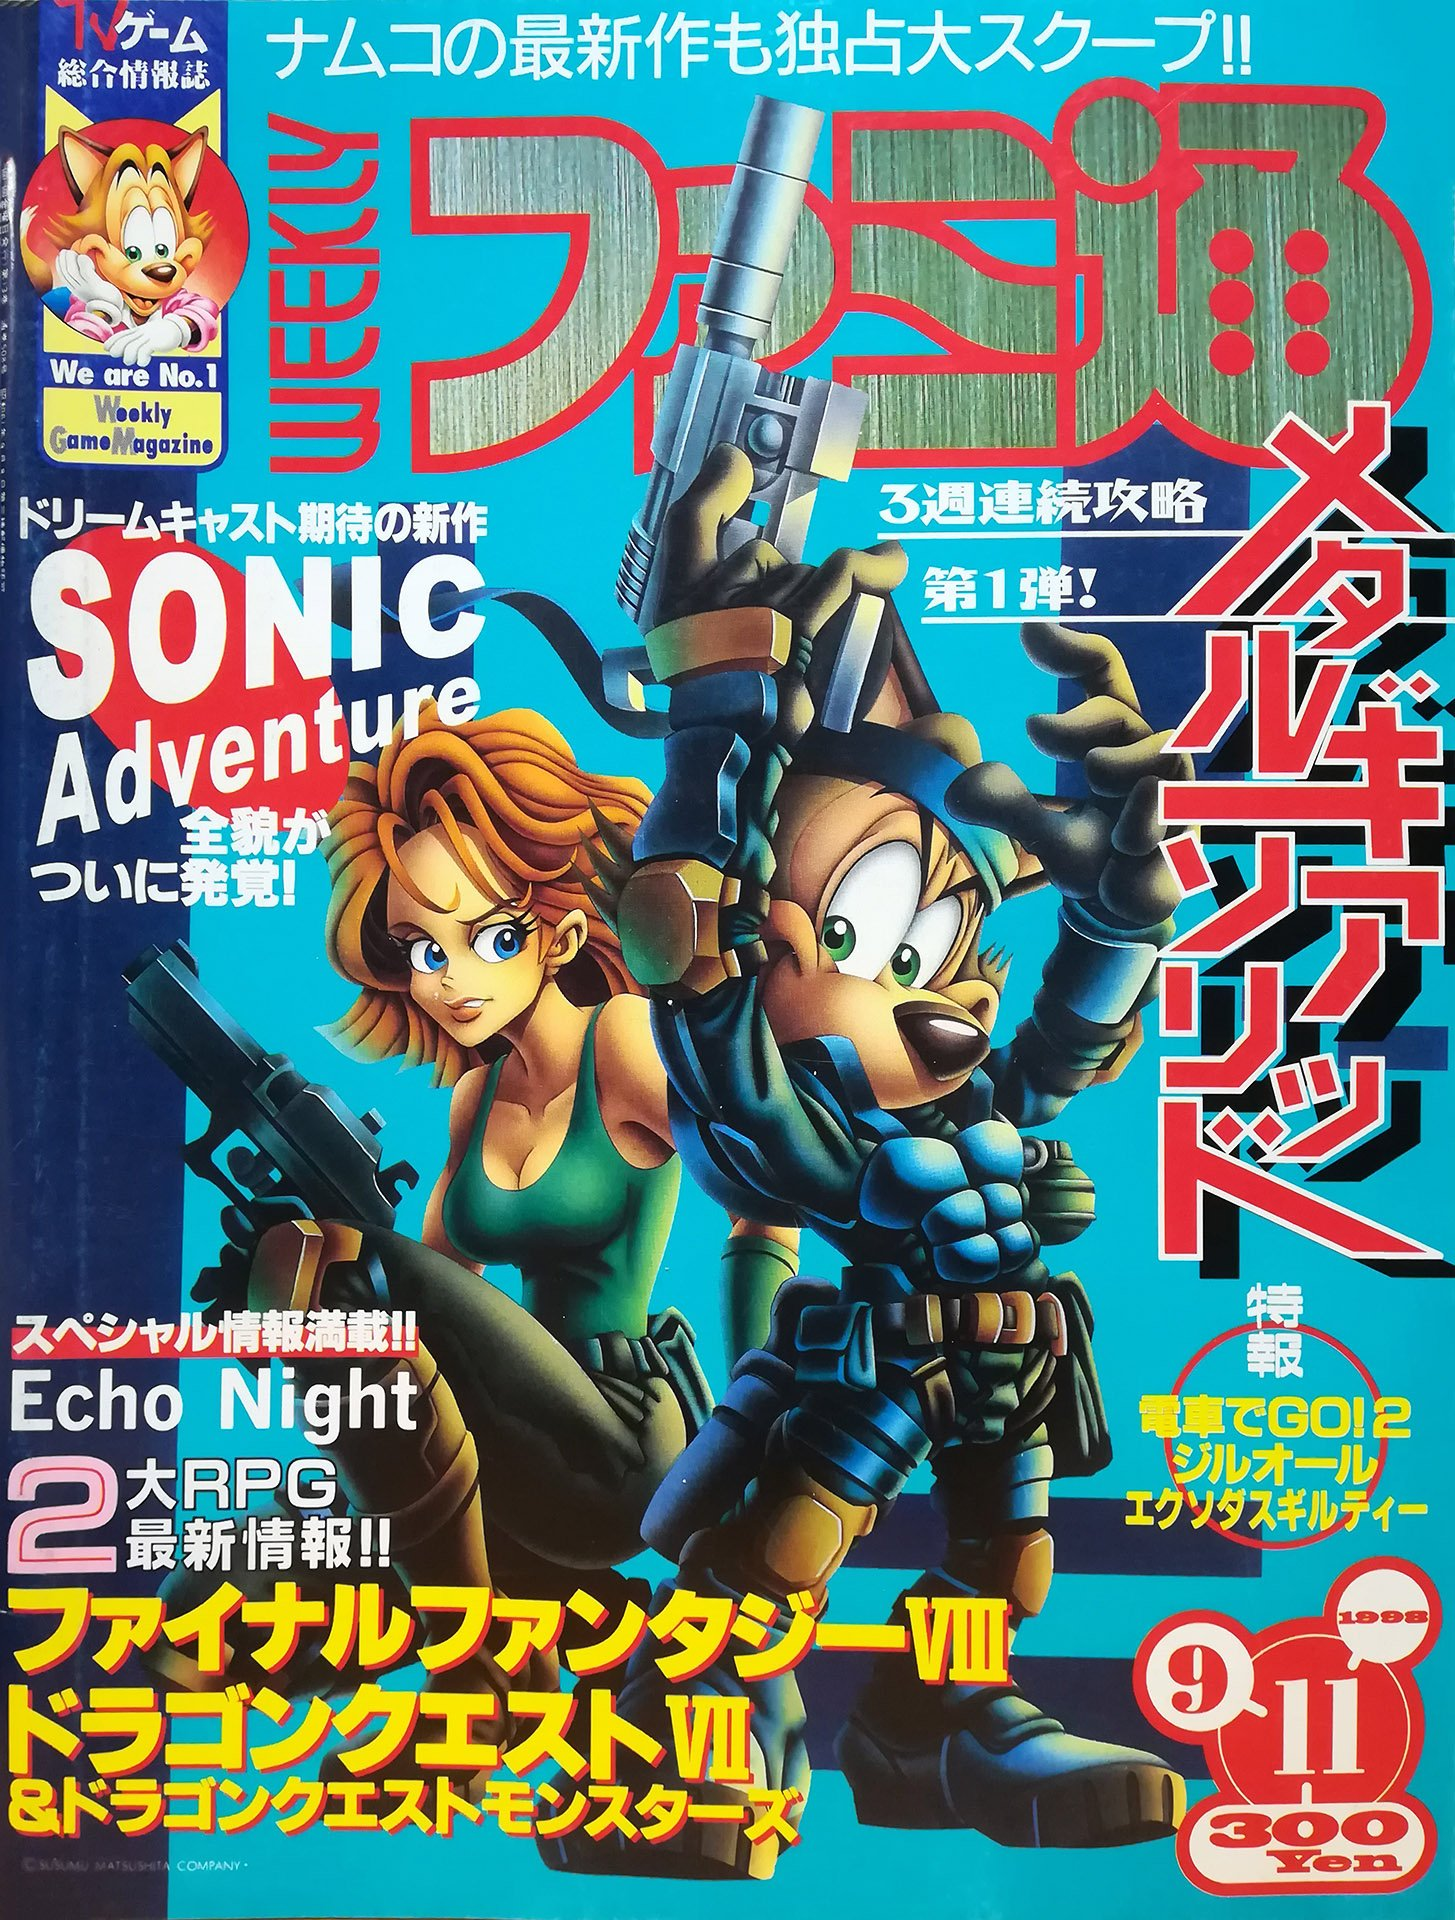 Famitsu 0508 (September 11, 1998)